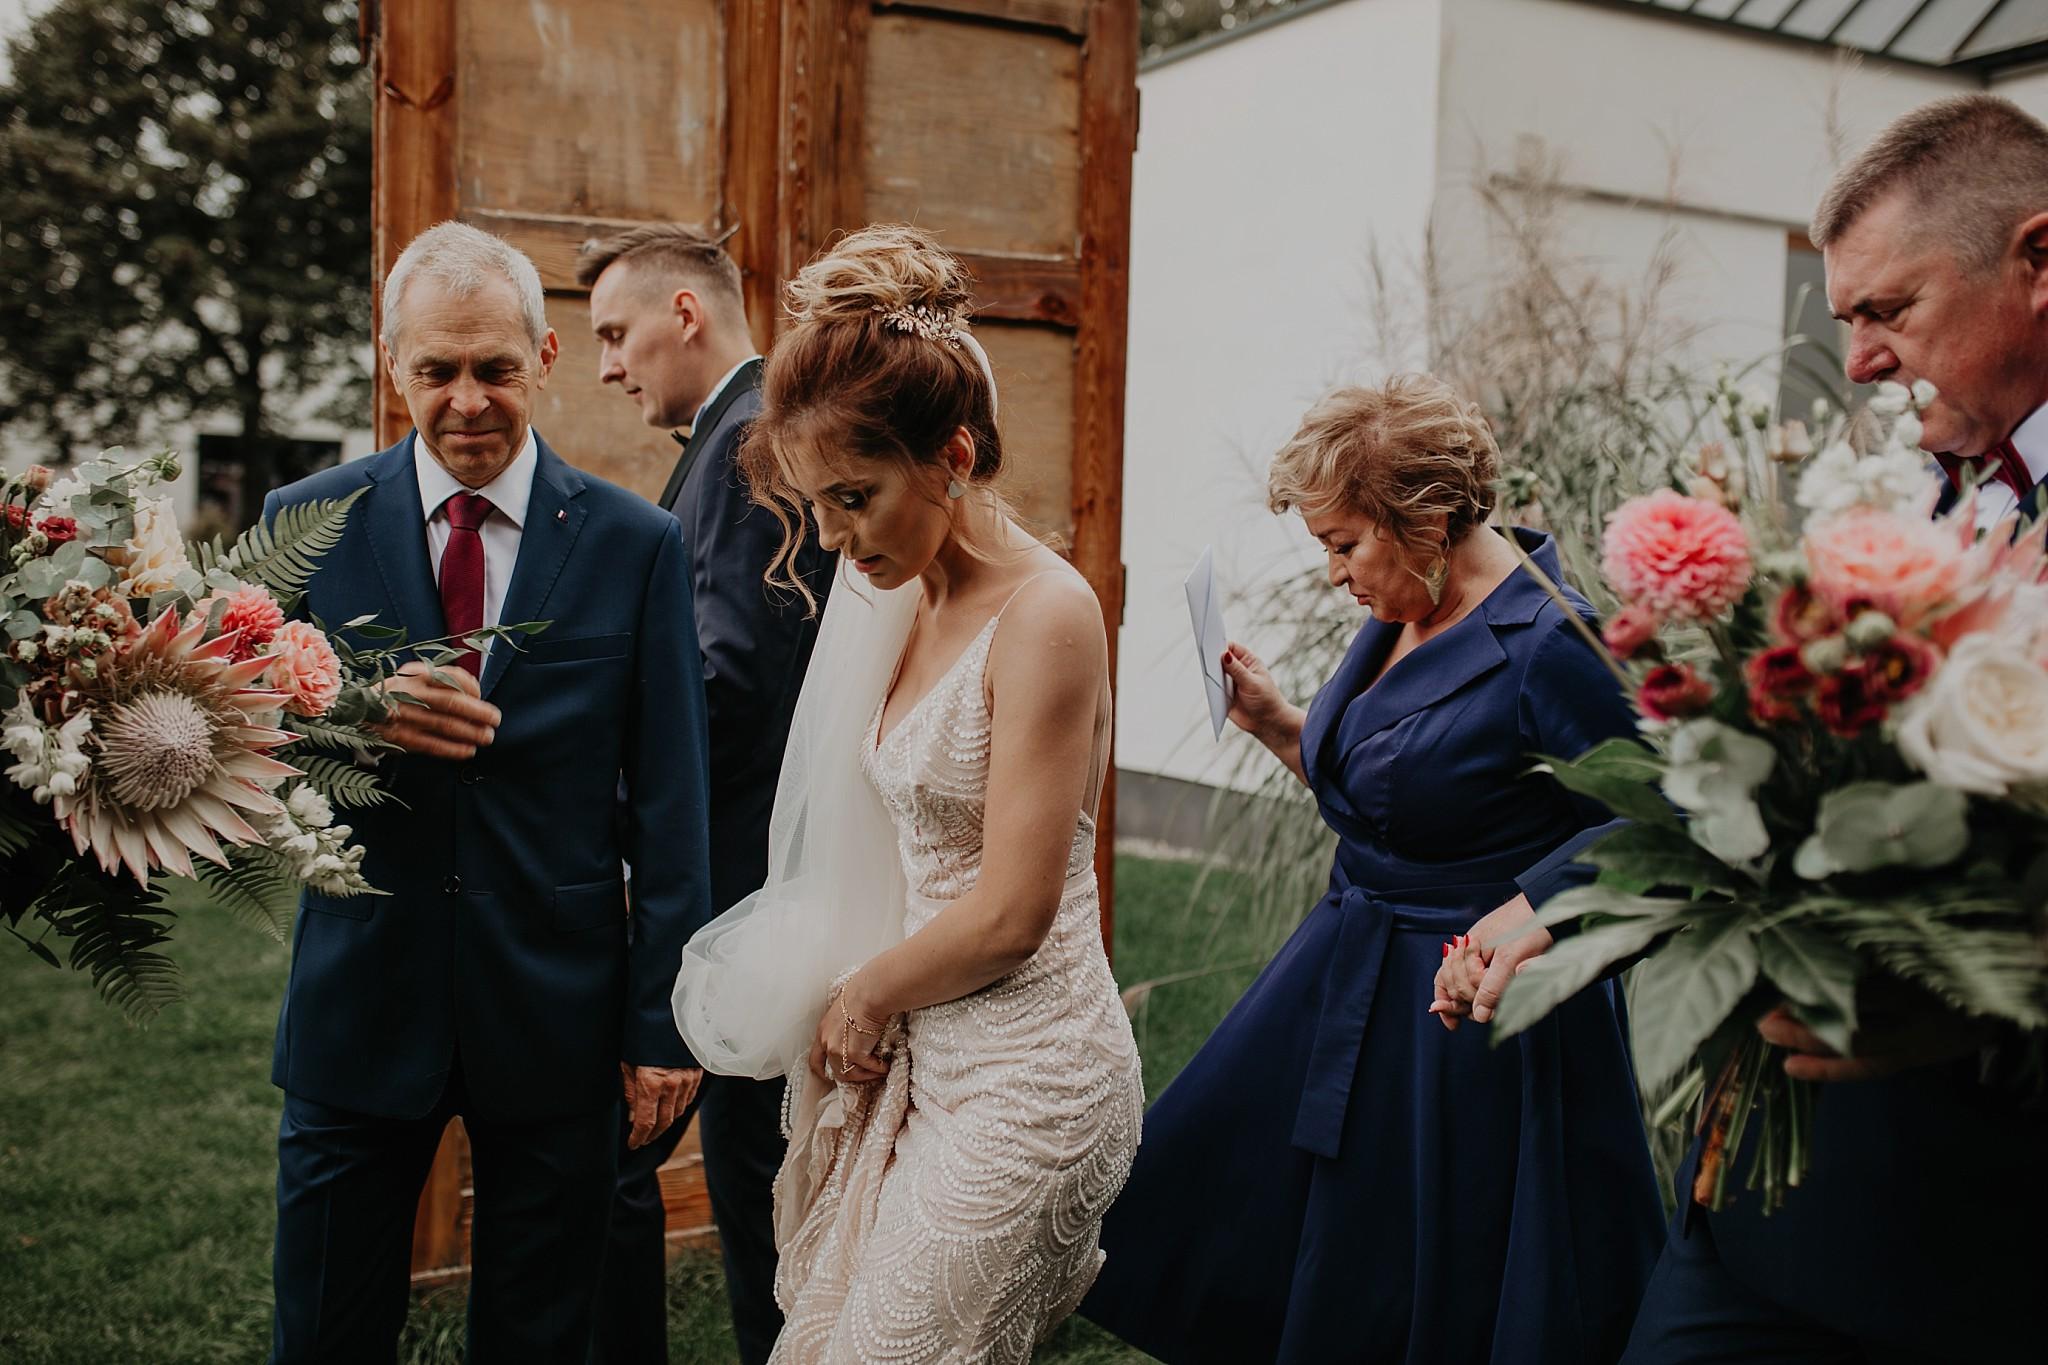 fotograf poznan wesele dobra truskawka piekne wesele pod poznaniem wesele w dobrej truskawce piekna para mloda slub marzen slub koronawirus slub listopad wesele koronawirus 110